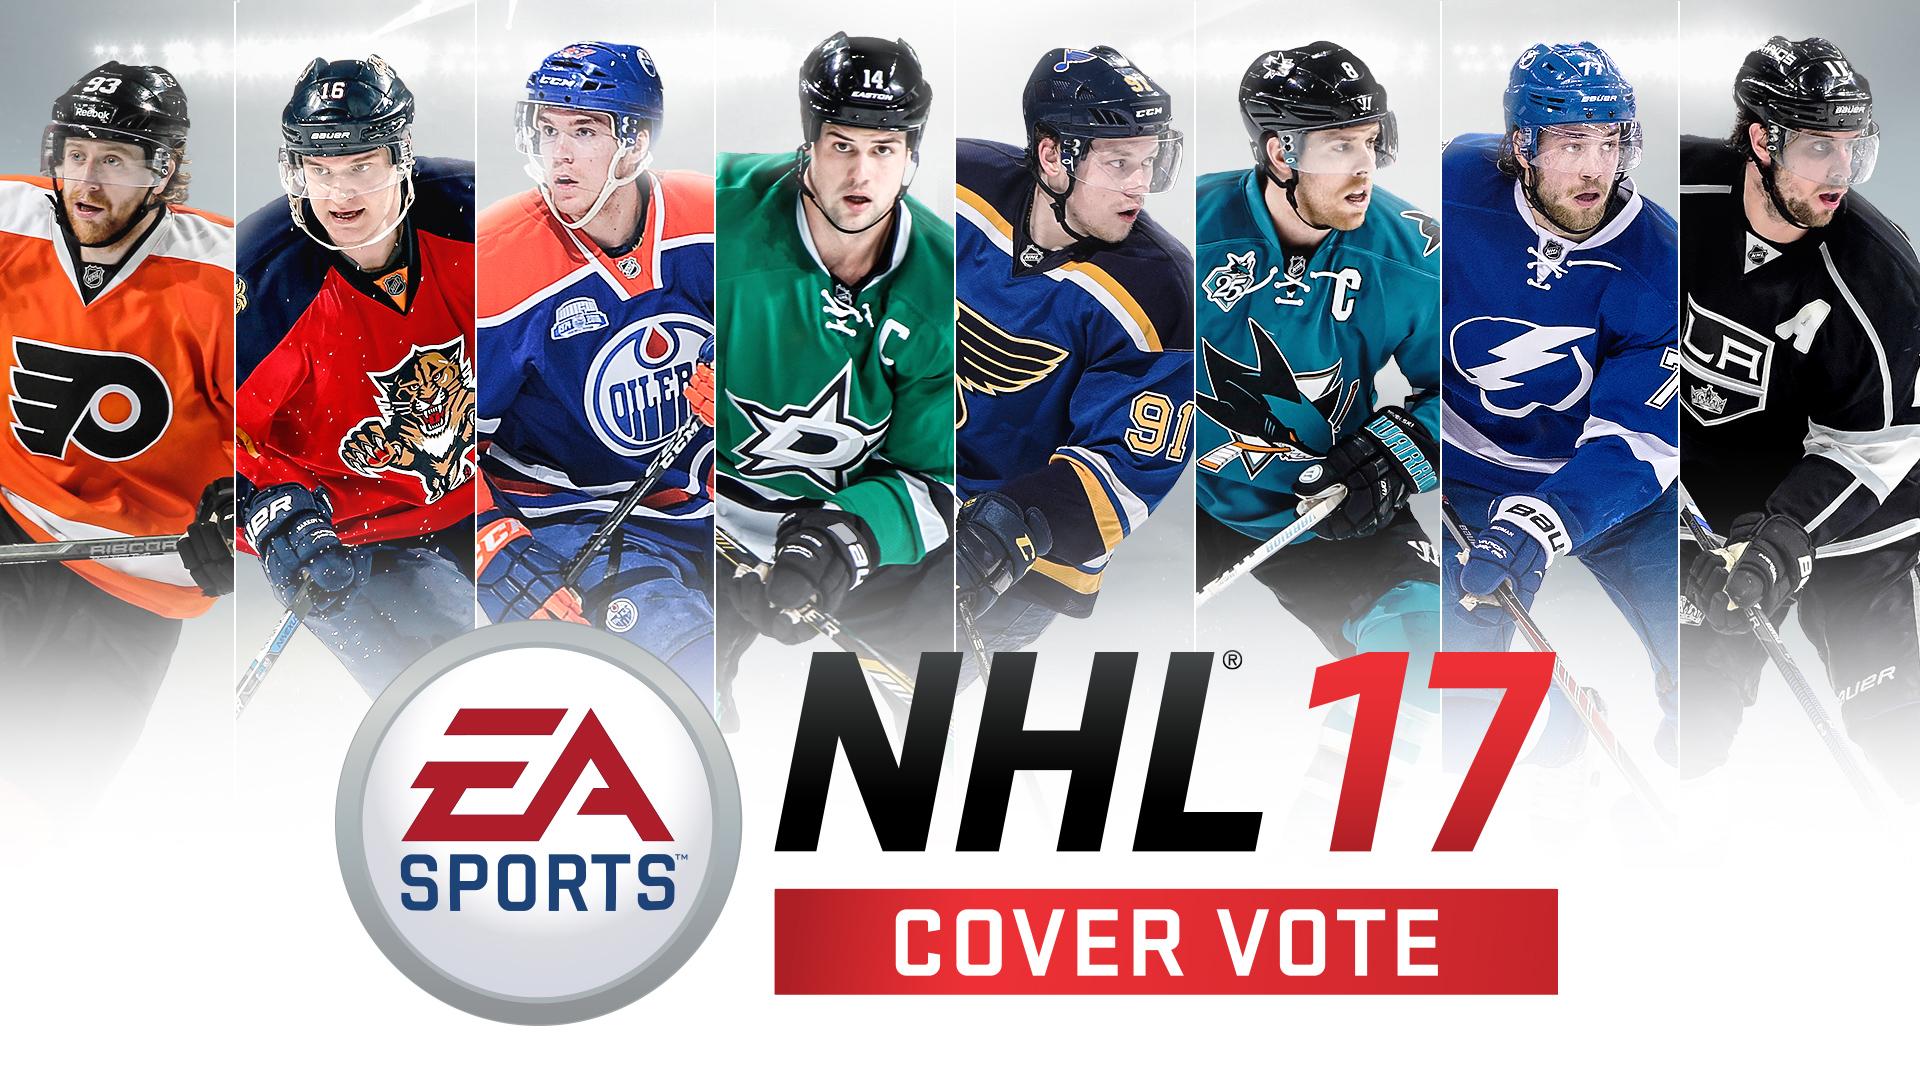 Apr18_NHL17_CoverVoteBannerV2_1920x1080.jpg